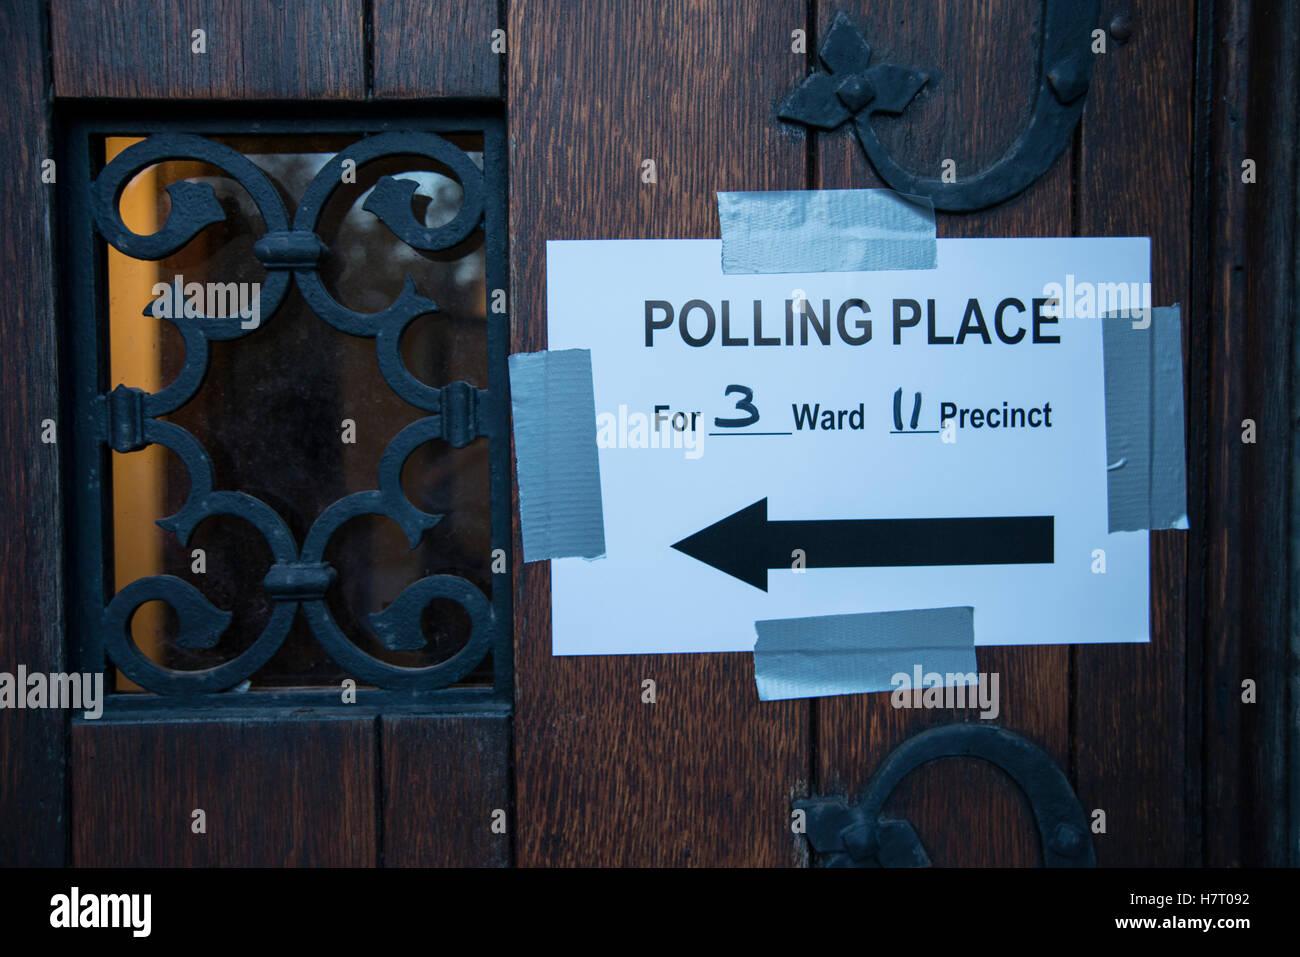 Polling Place on Nov 8 th, Election Day at Presbyterian Church, Bolton Hill, Baltimore, Maryland, USA © Yuriy Zahvoyskyy Stock Photo